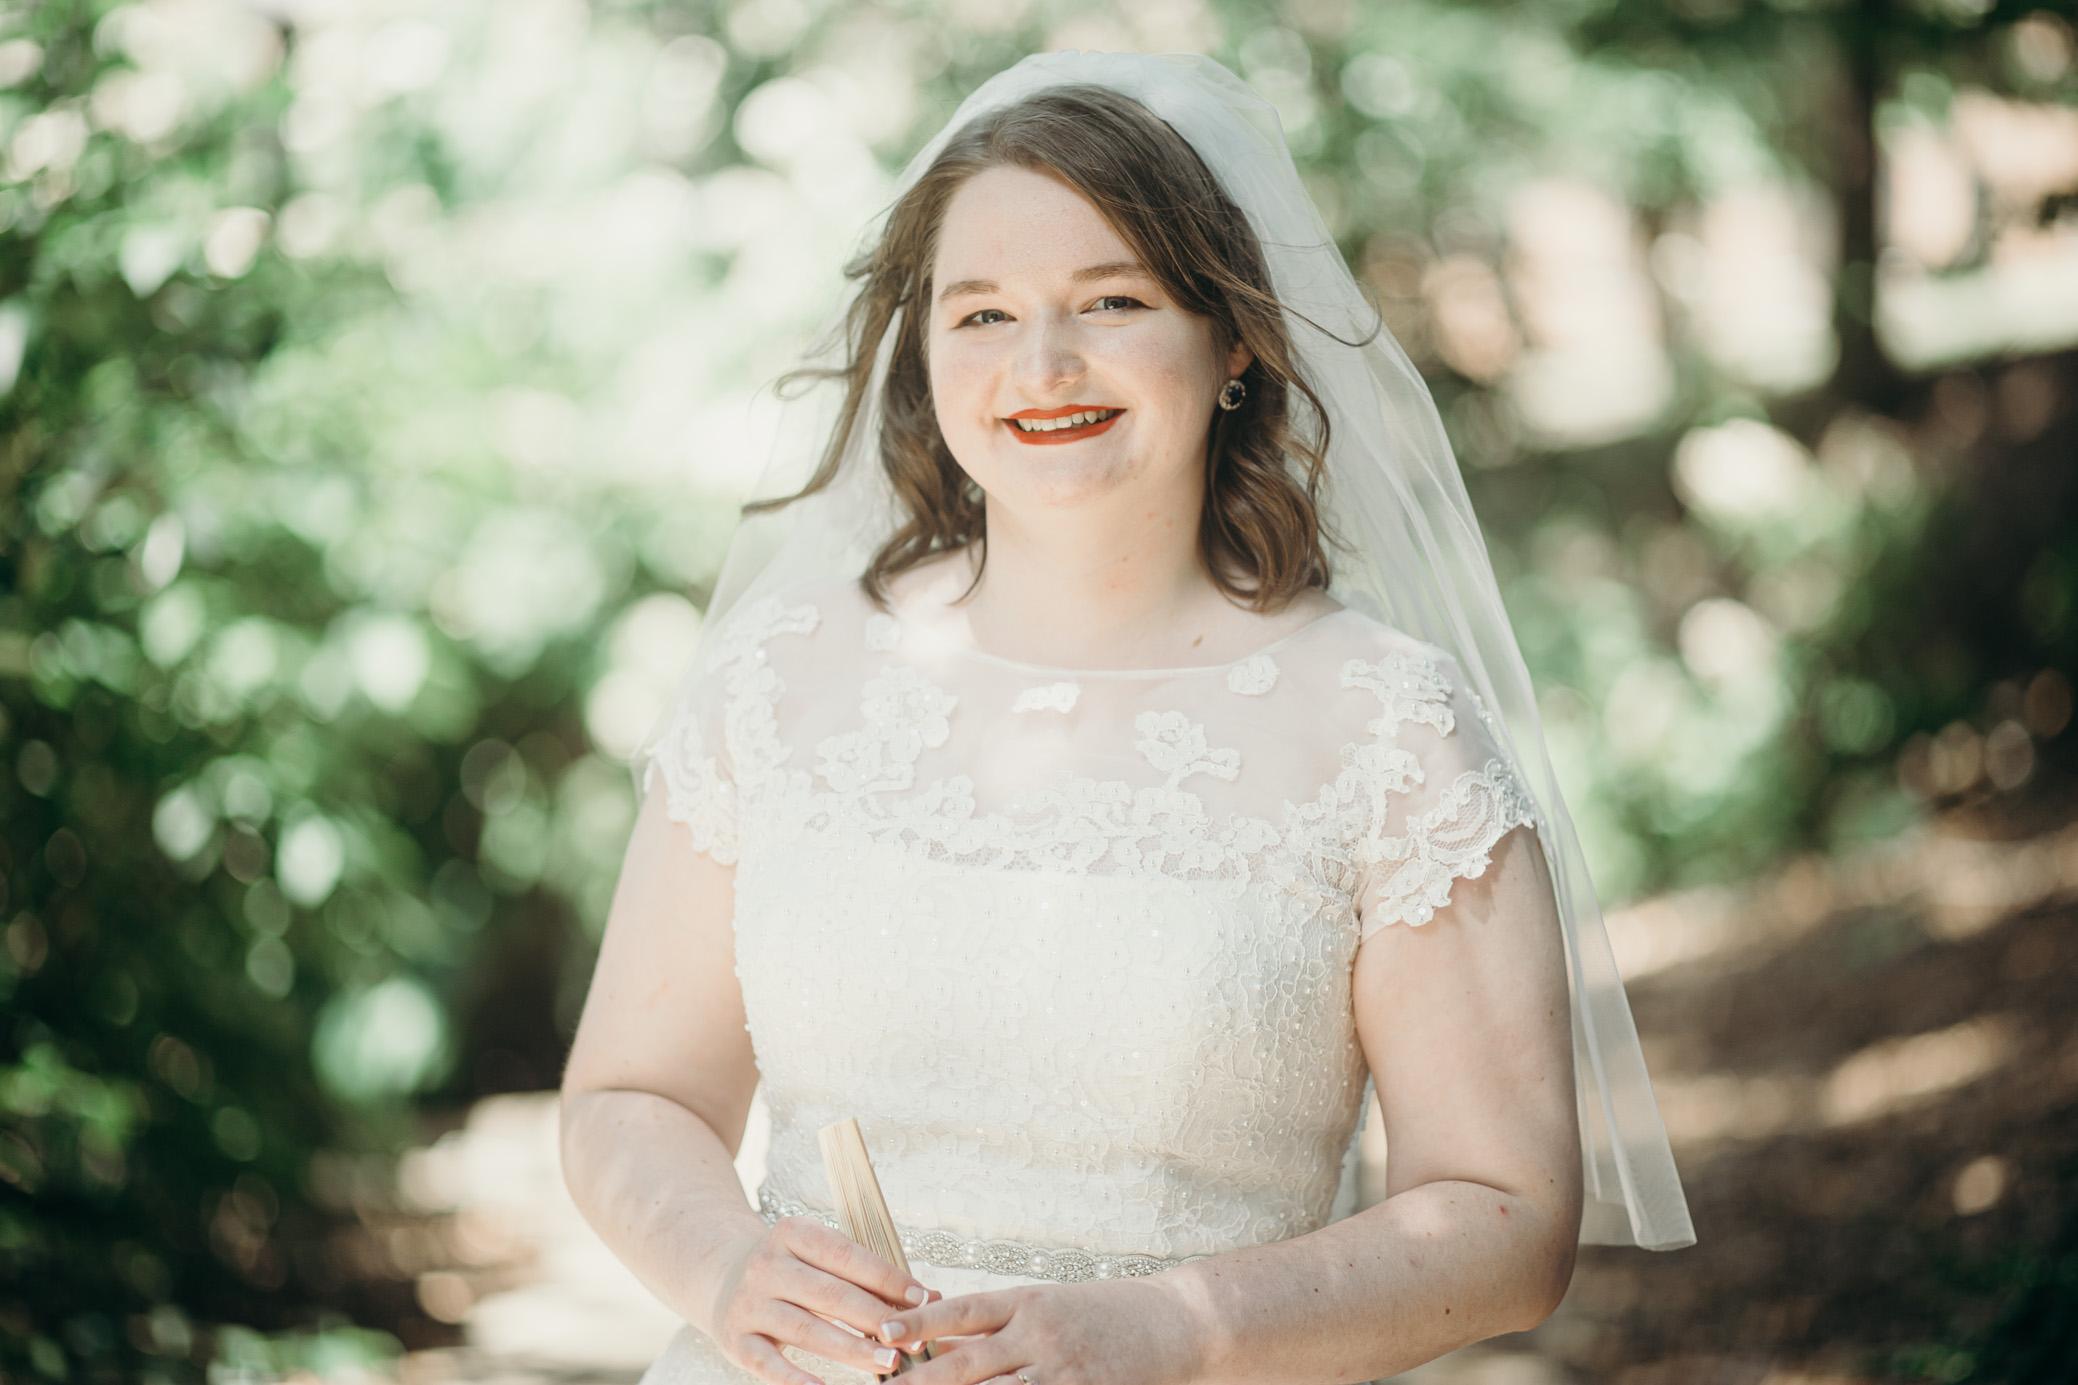 Atlanta Georgia wedding photography by David A. Smith of DSmithImages Wedding Photography, Portraits, and Events, a wedding photographer in Birmingham, Alabama